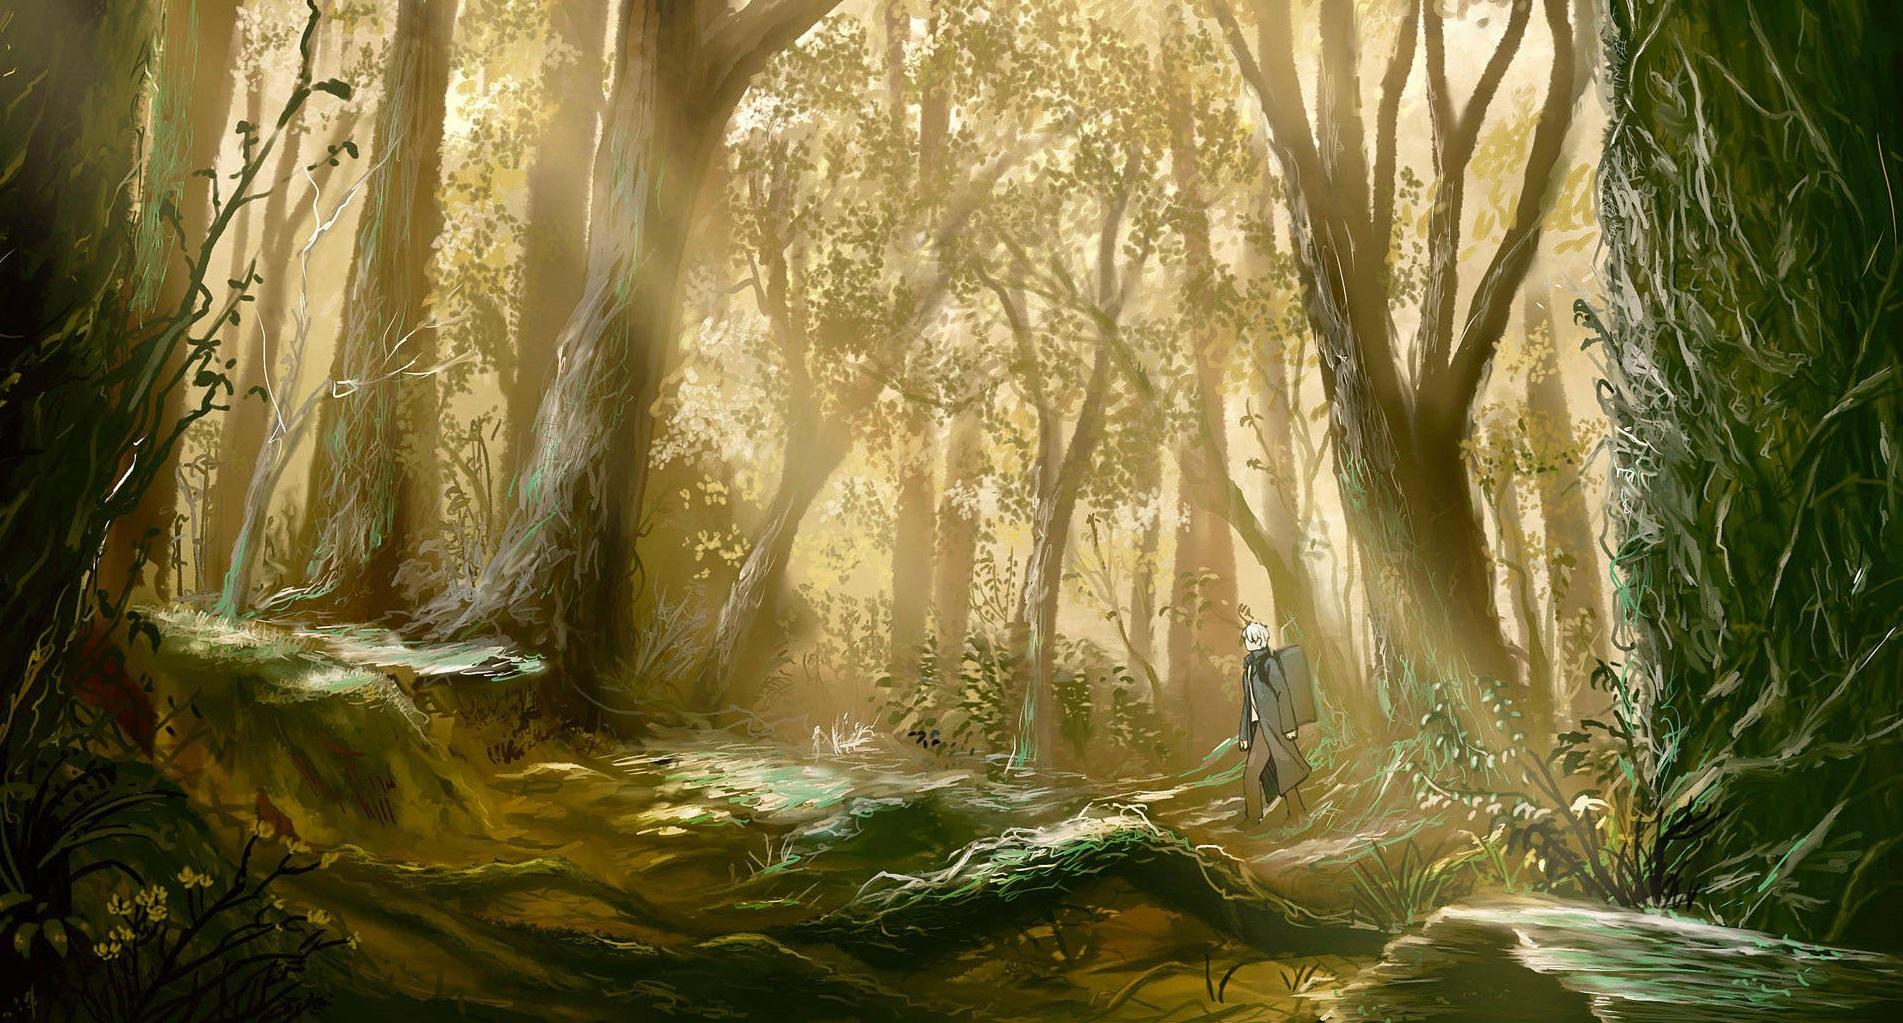 23 Anime Forest Wallpaper On Wallpapersafari